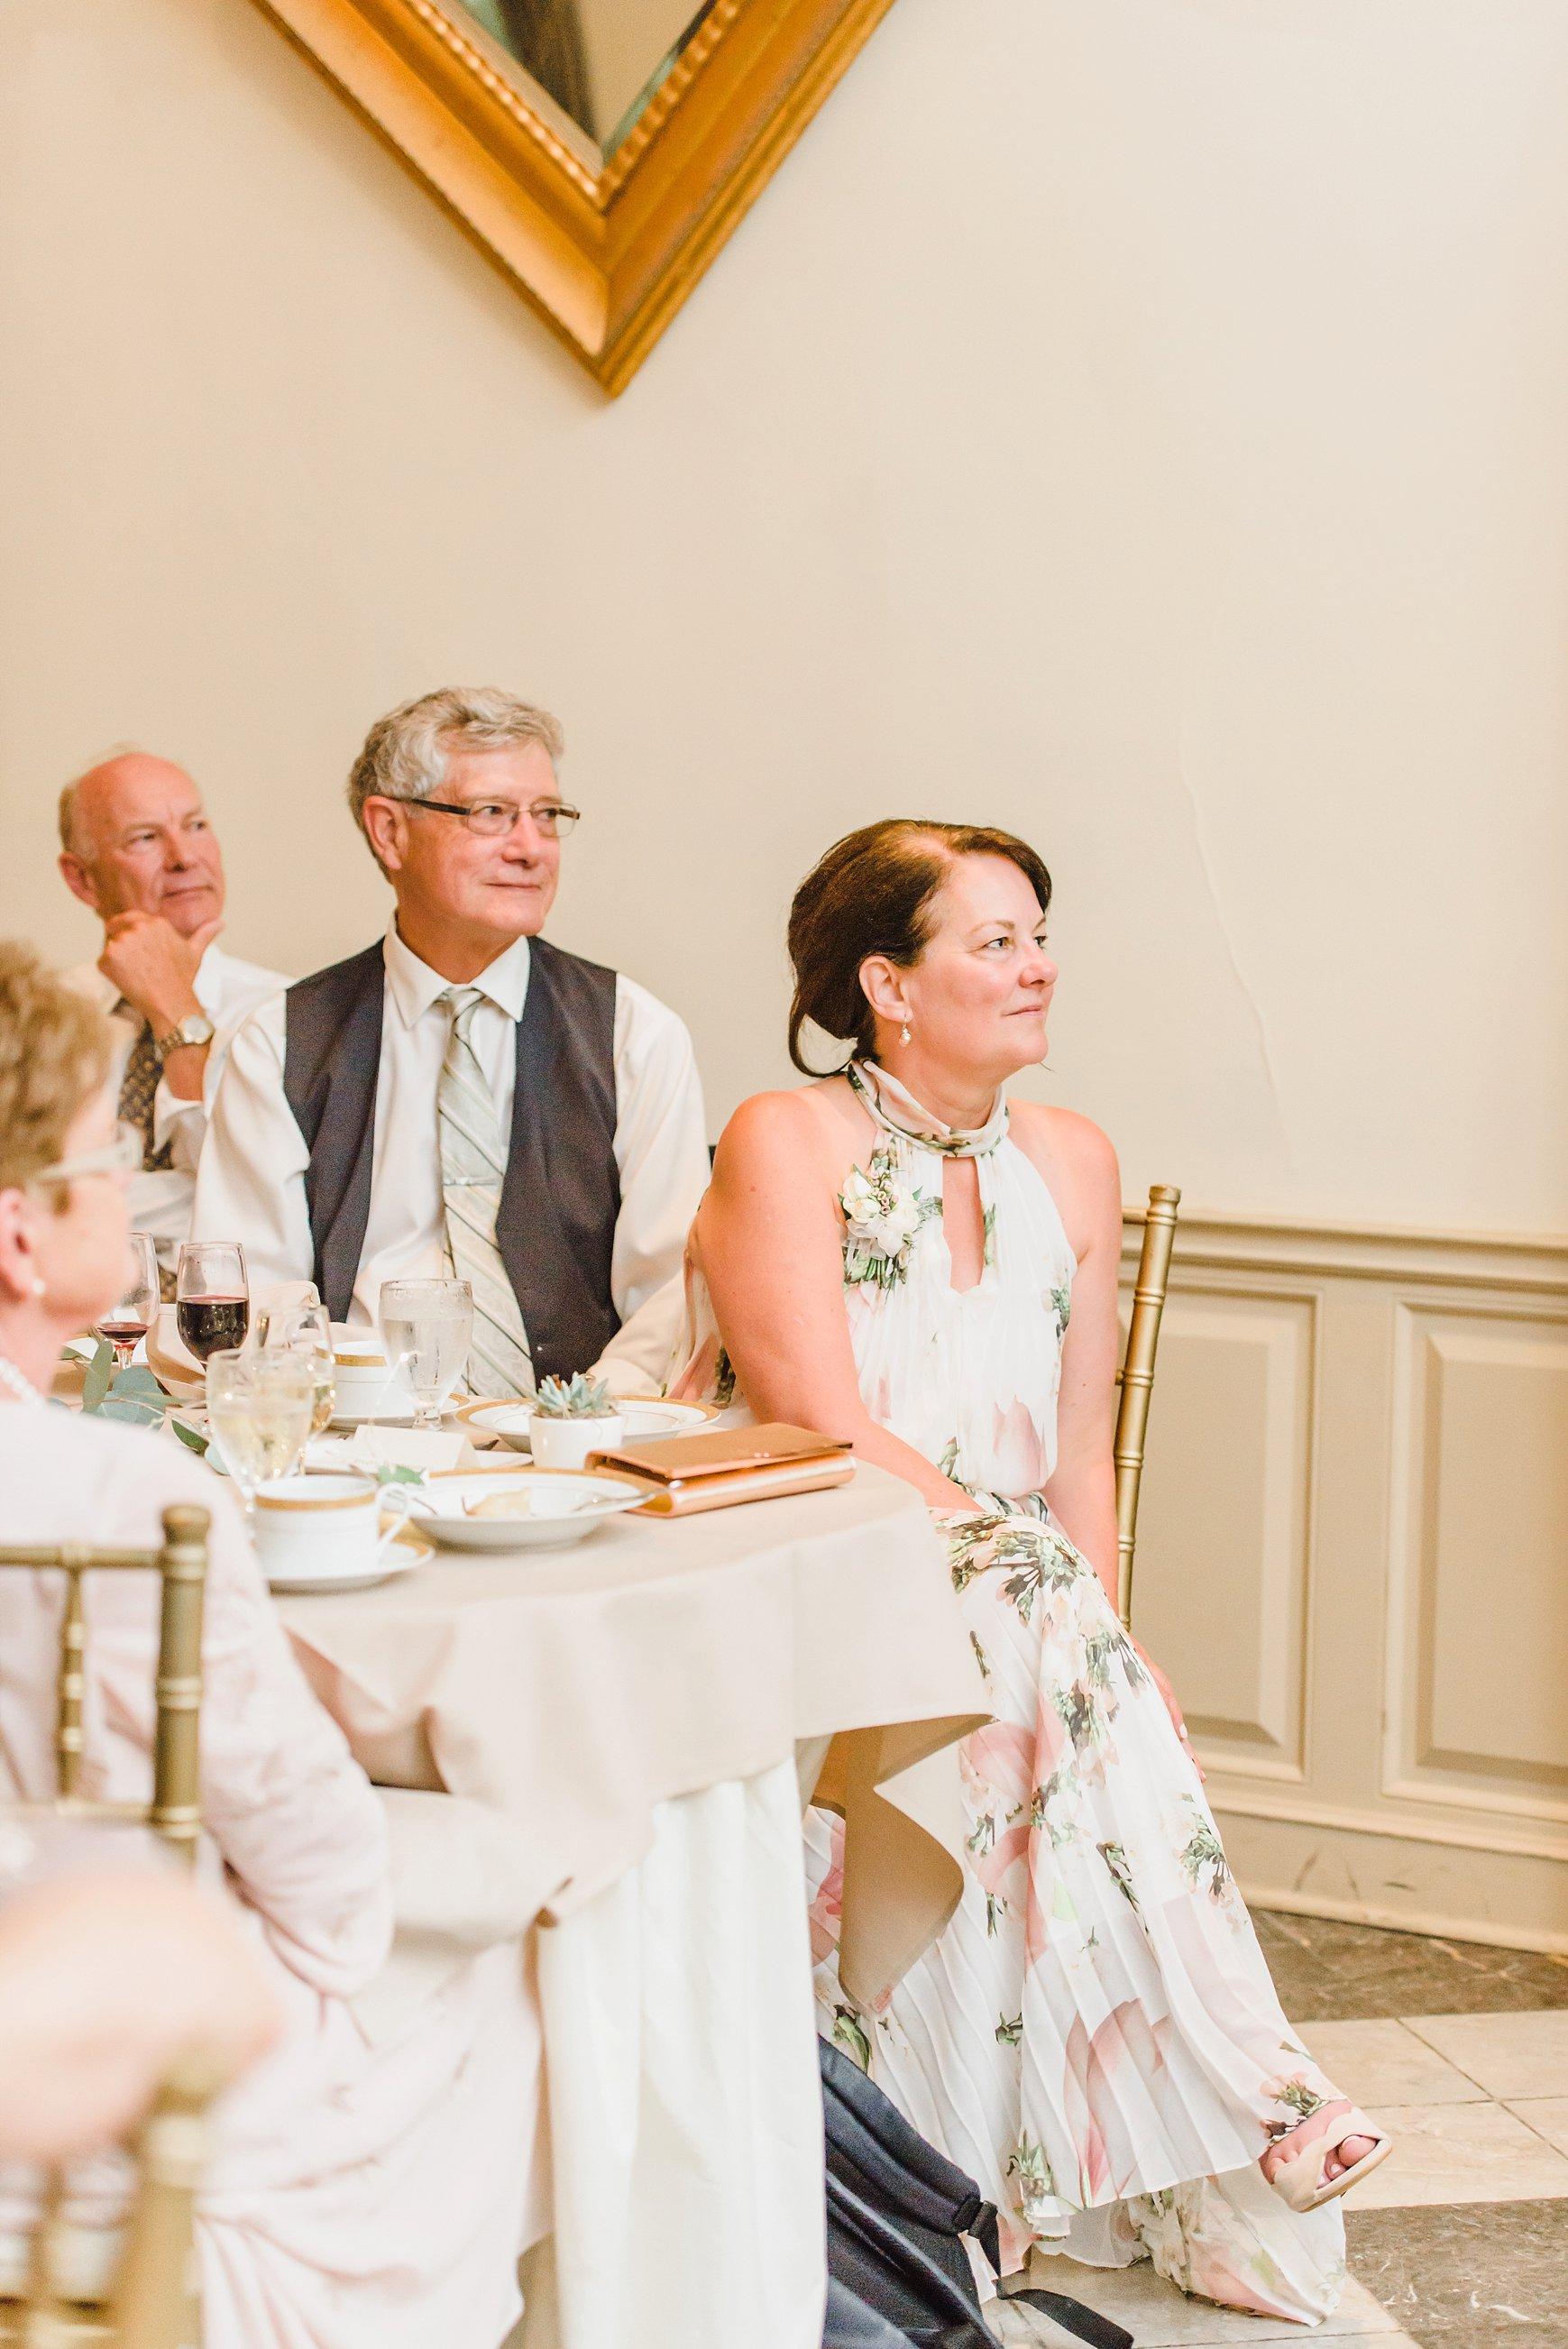 light airy indie fine art ottawa wedding photographer | Ali and Batoul Photography_0228.jpg